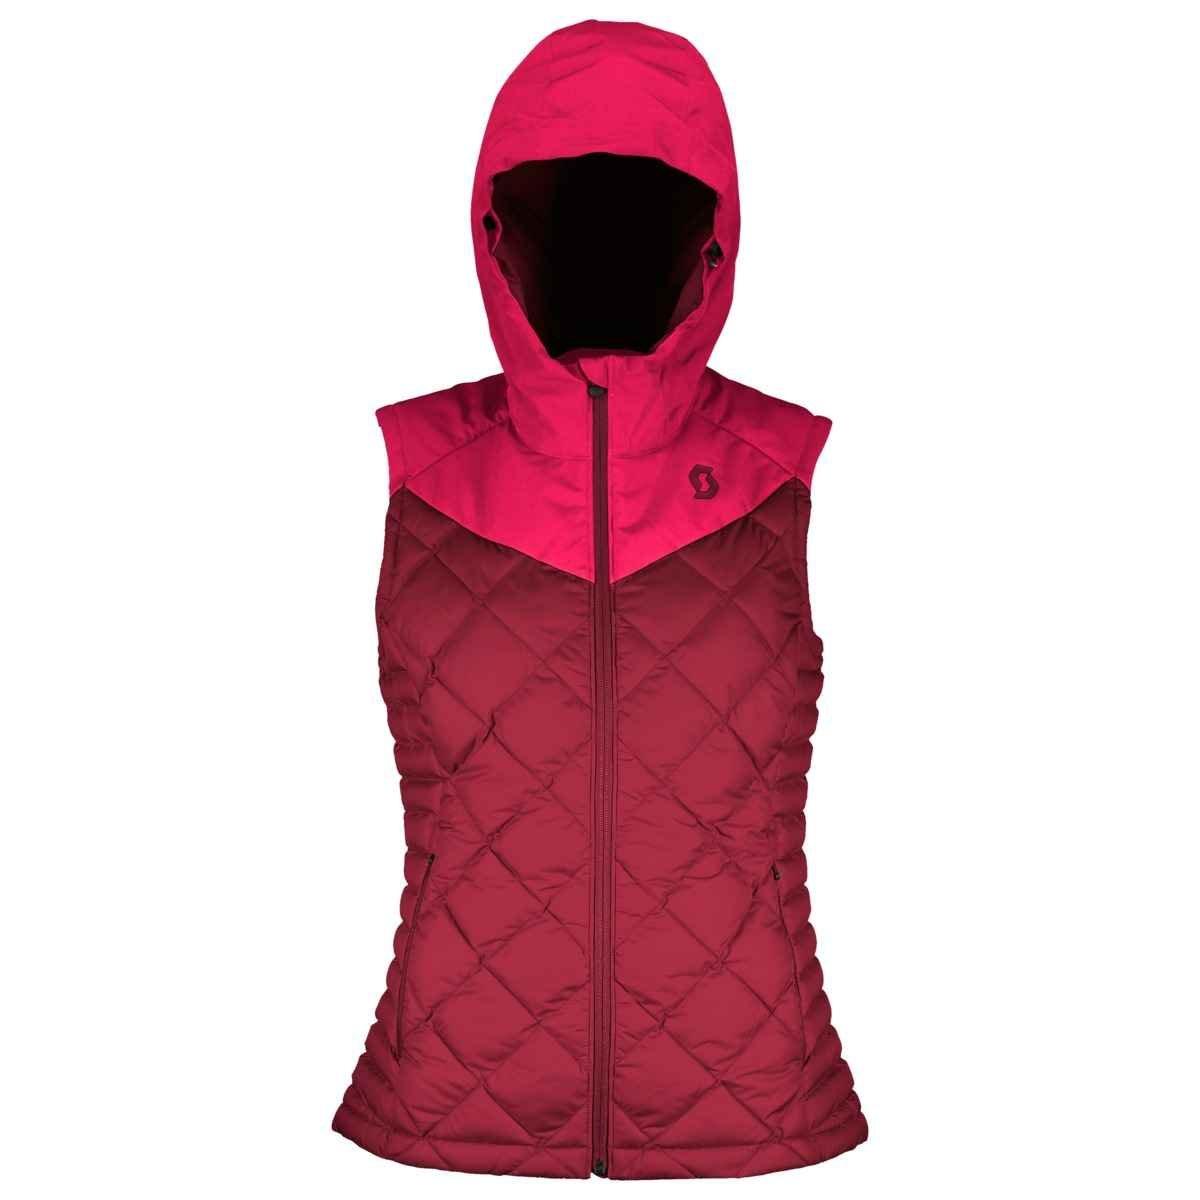 Scott Insuloft 3M Vest Womens 2619955666006